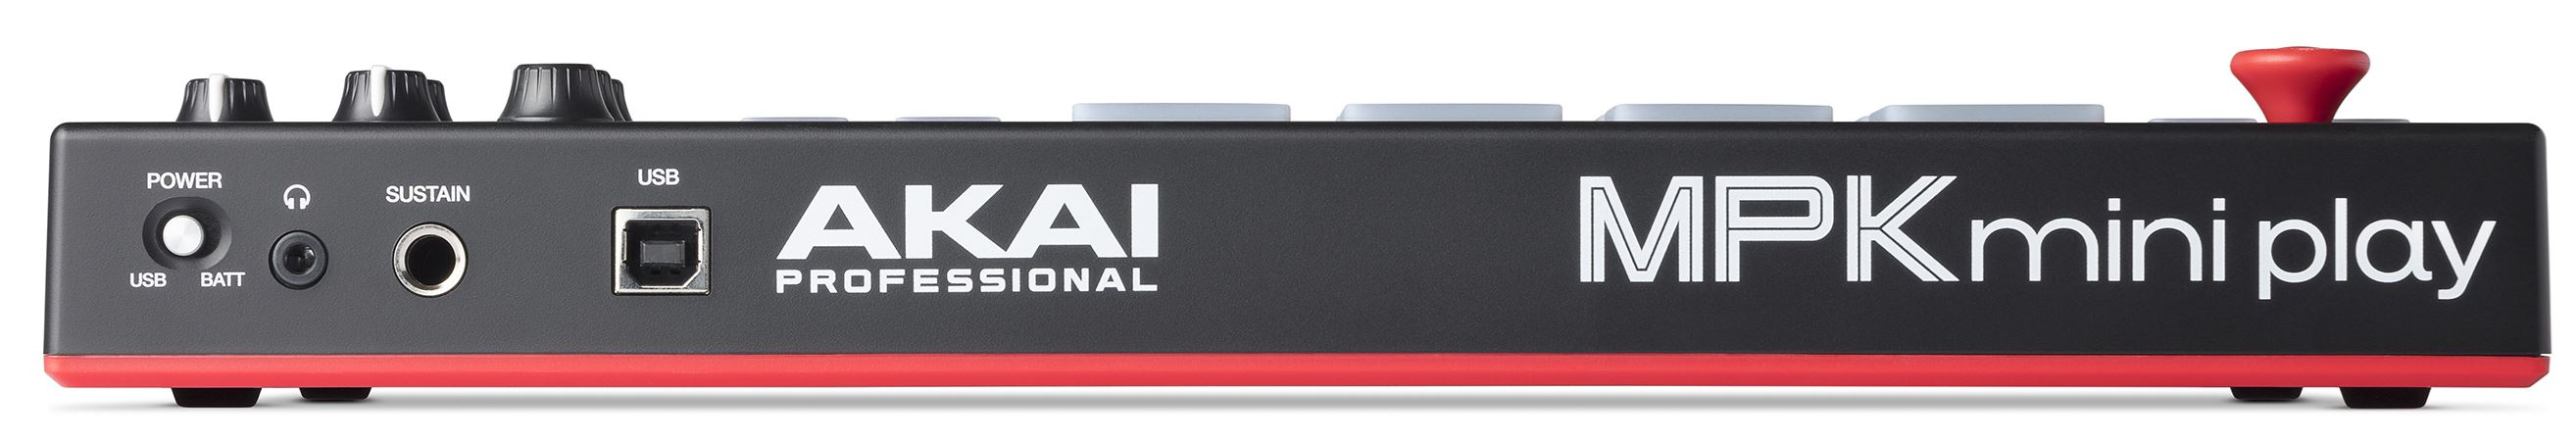 MPK Miniplay Keyboard og USB Controller